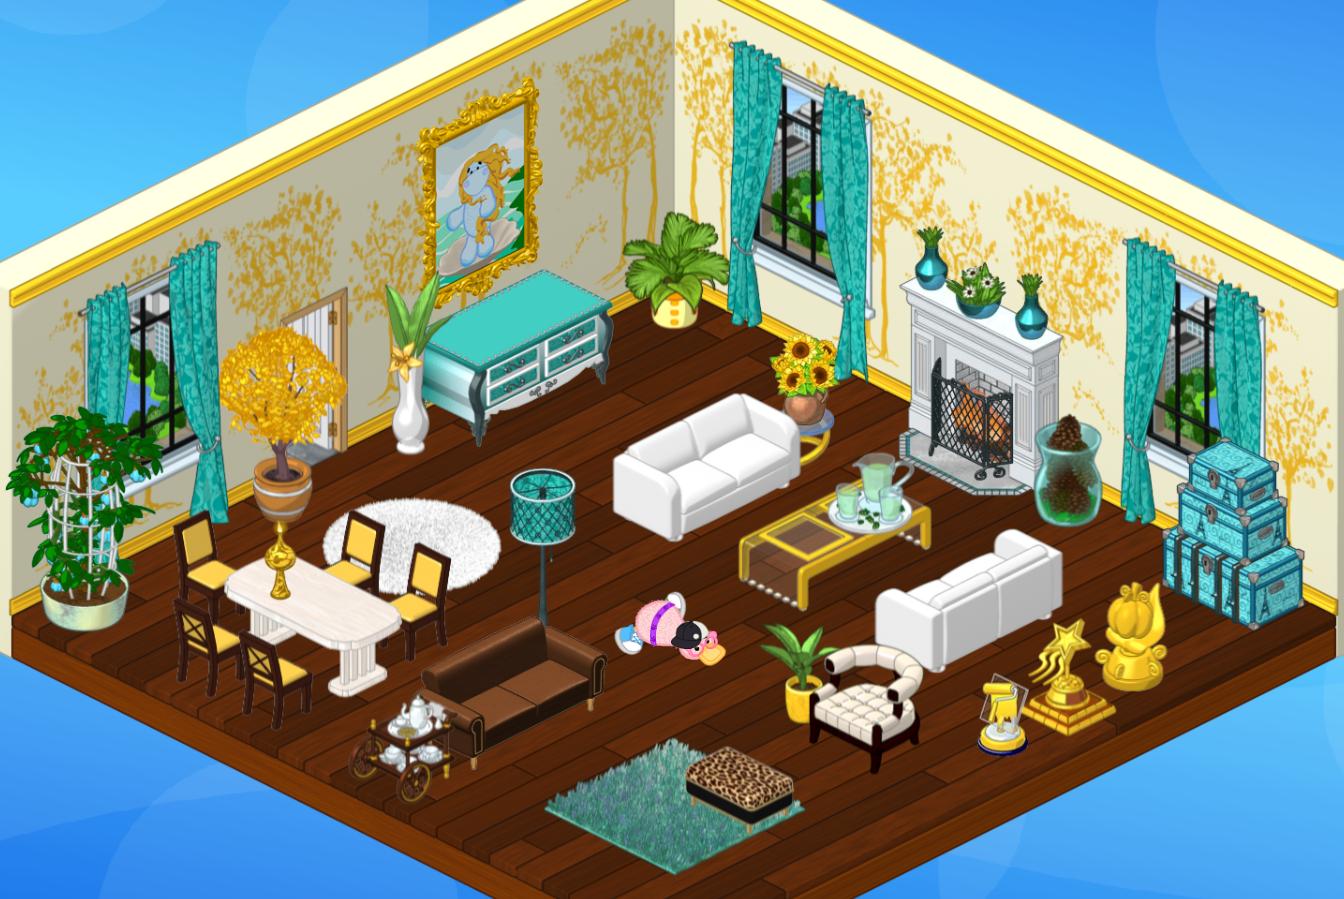 Blue Ave Room On Webkinz Webkinz Webkinz Stuffed Animals Room Design